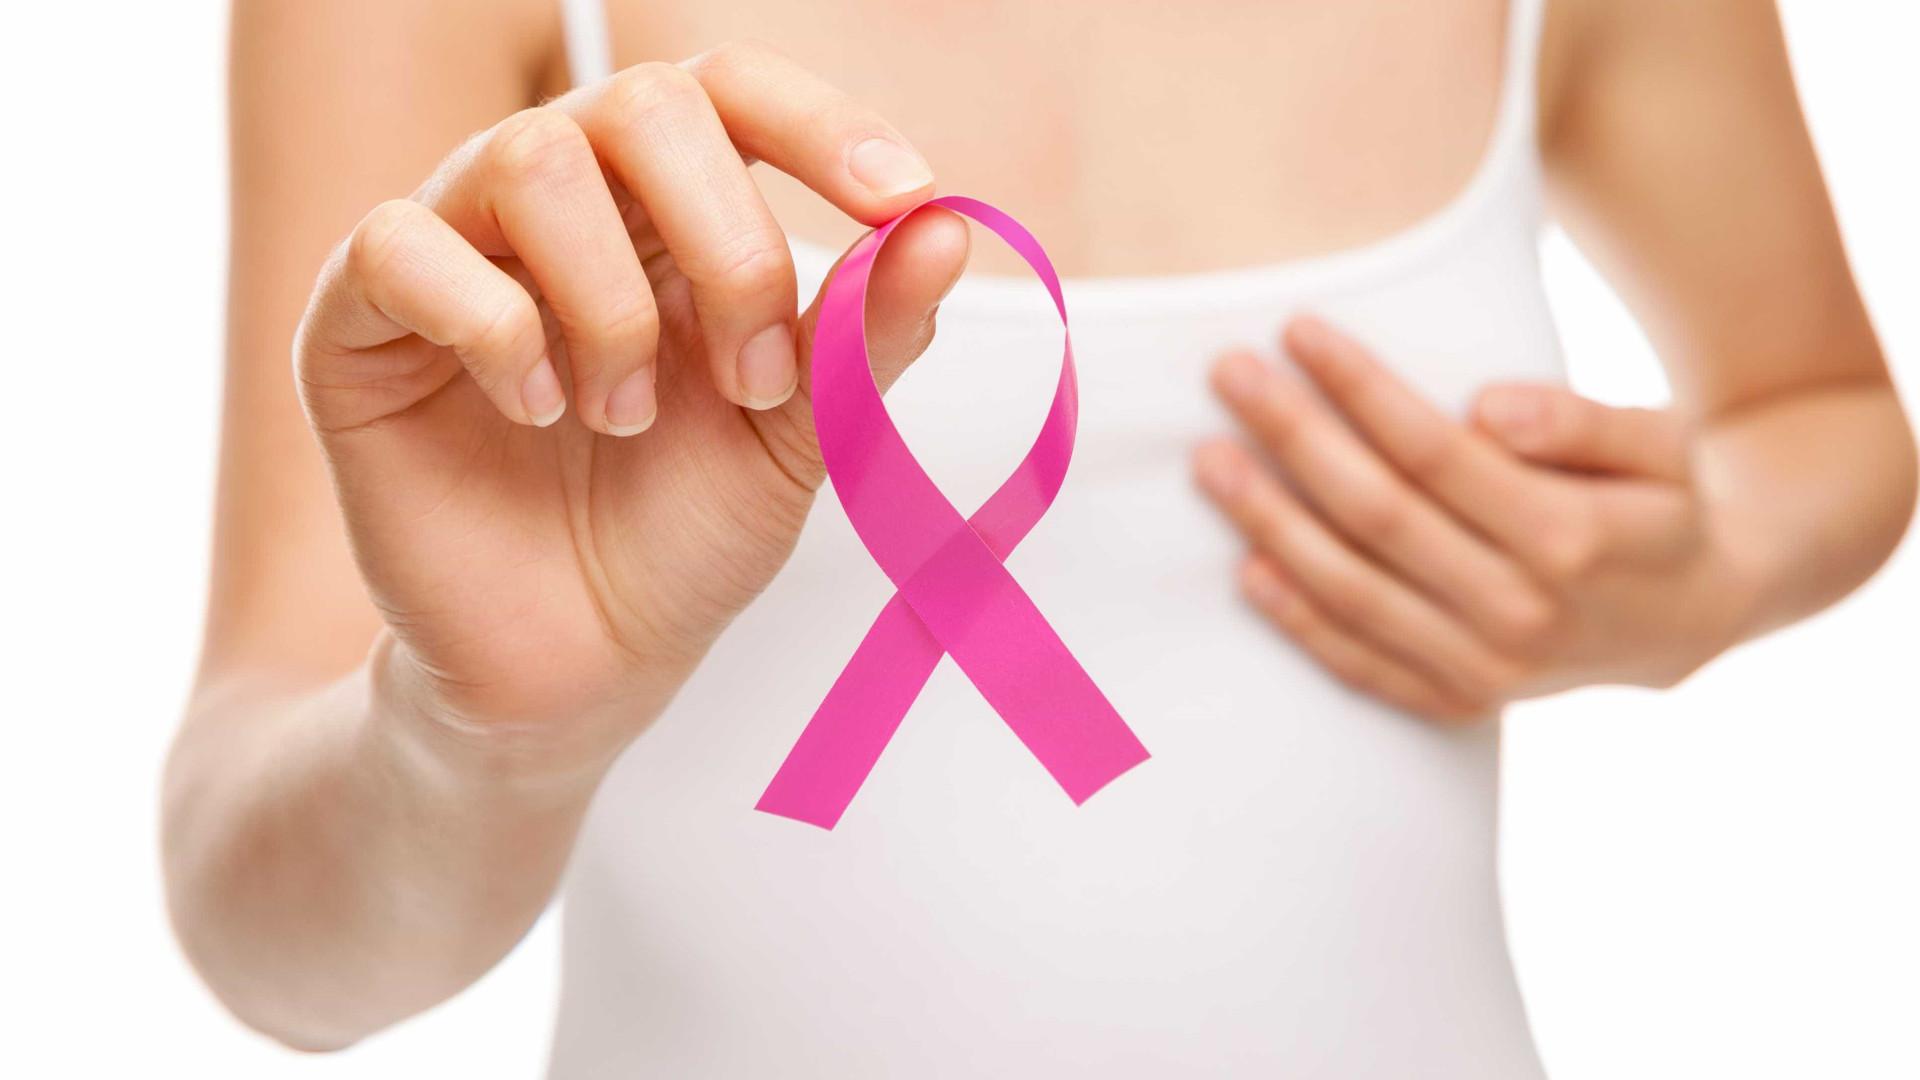 Os dez maiores fatores de risco do cancro da mama